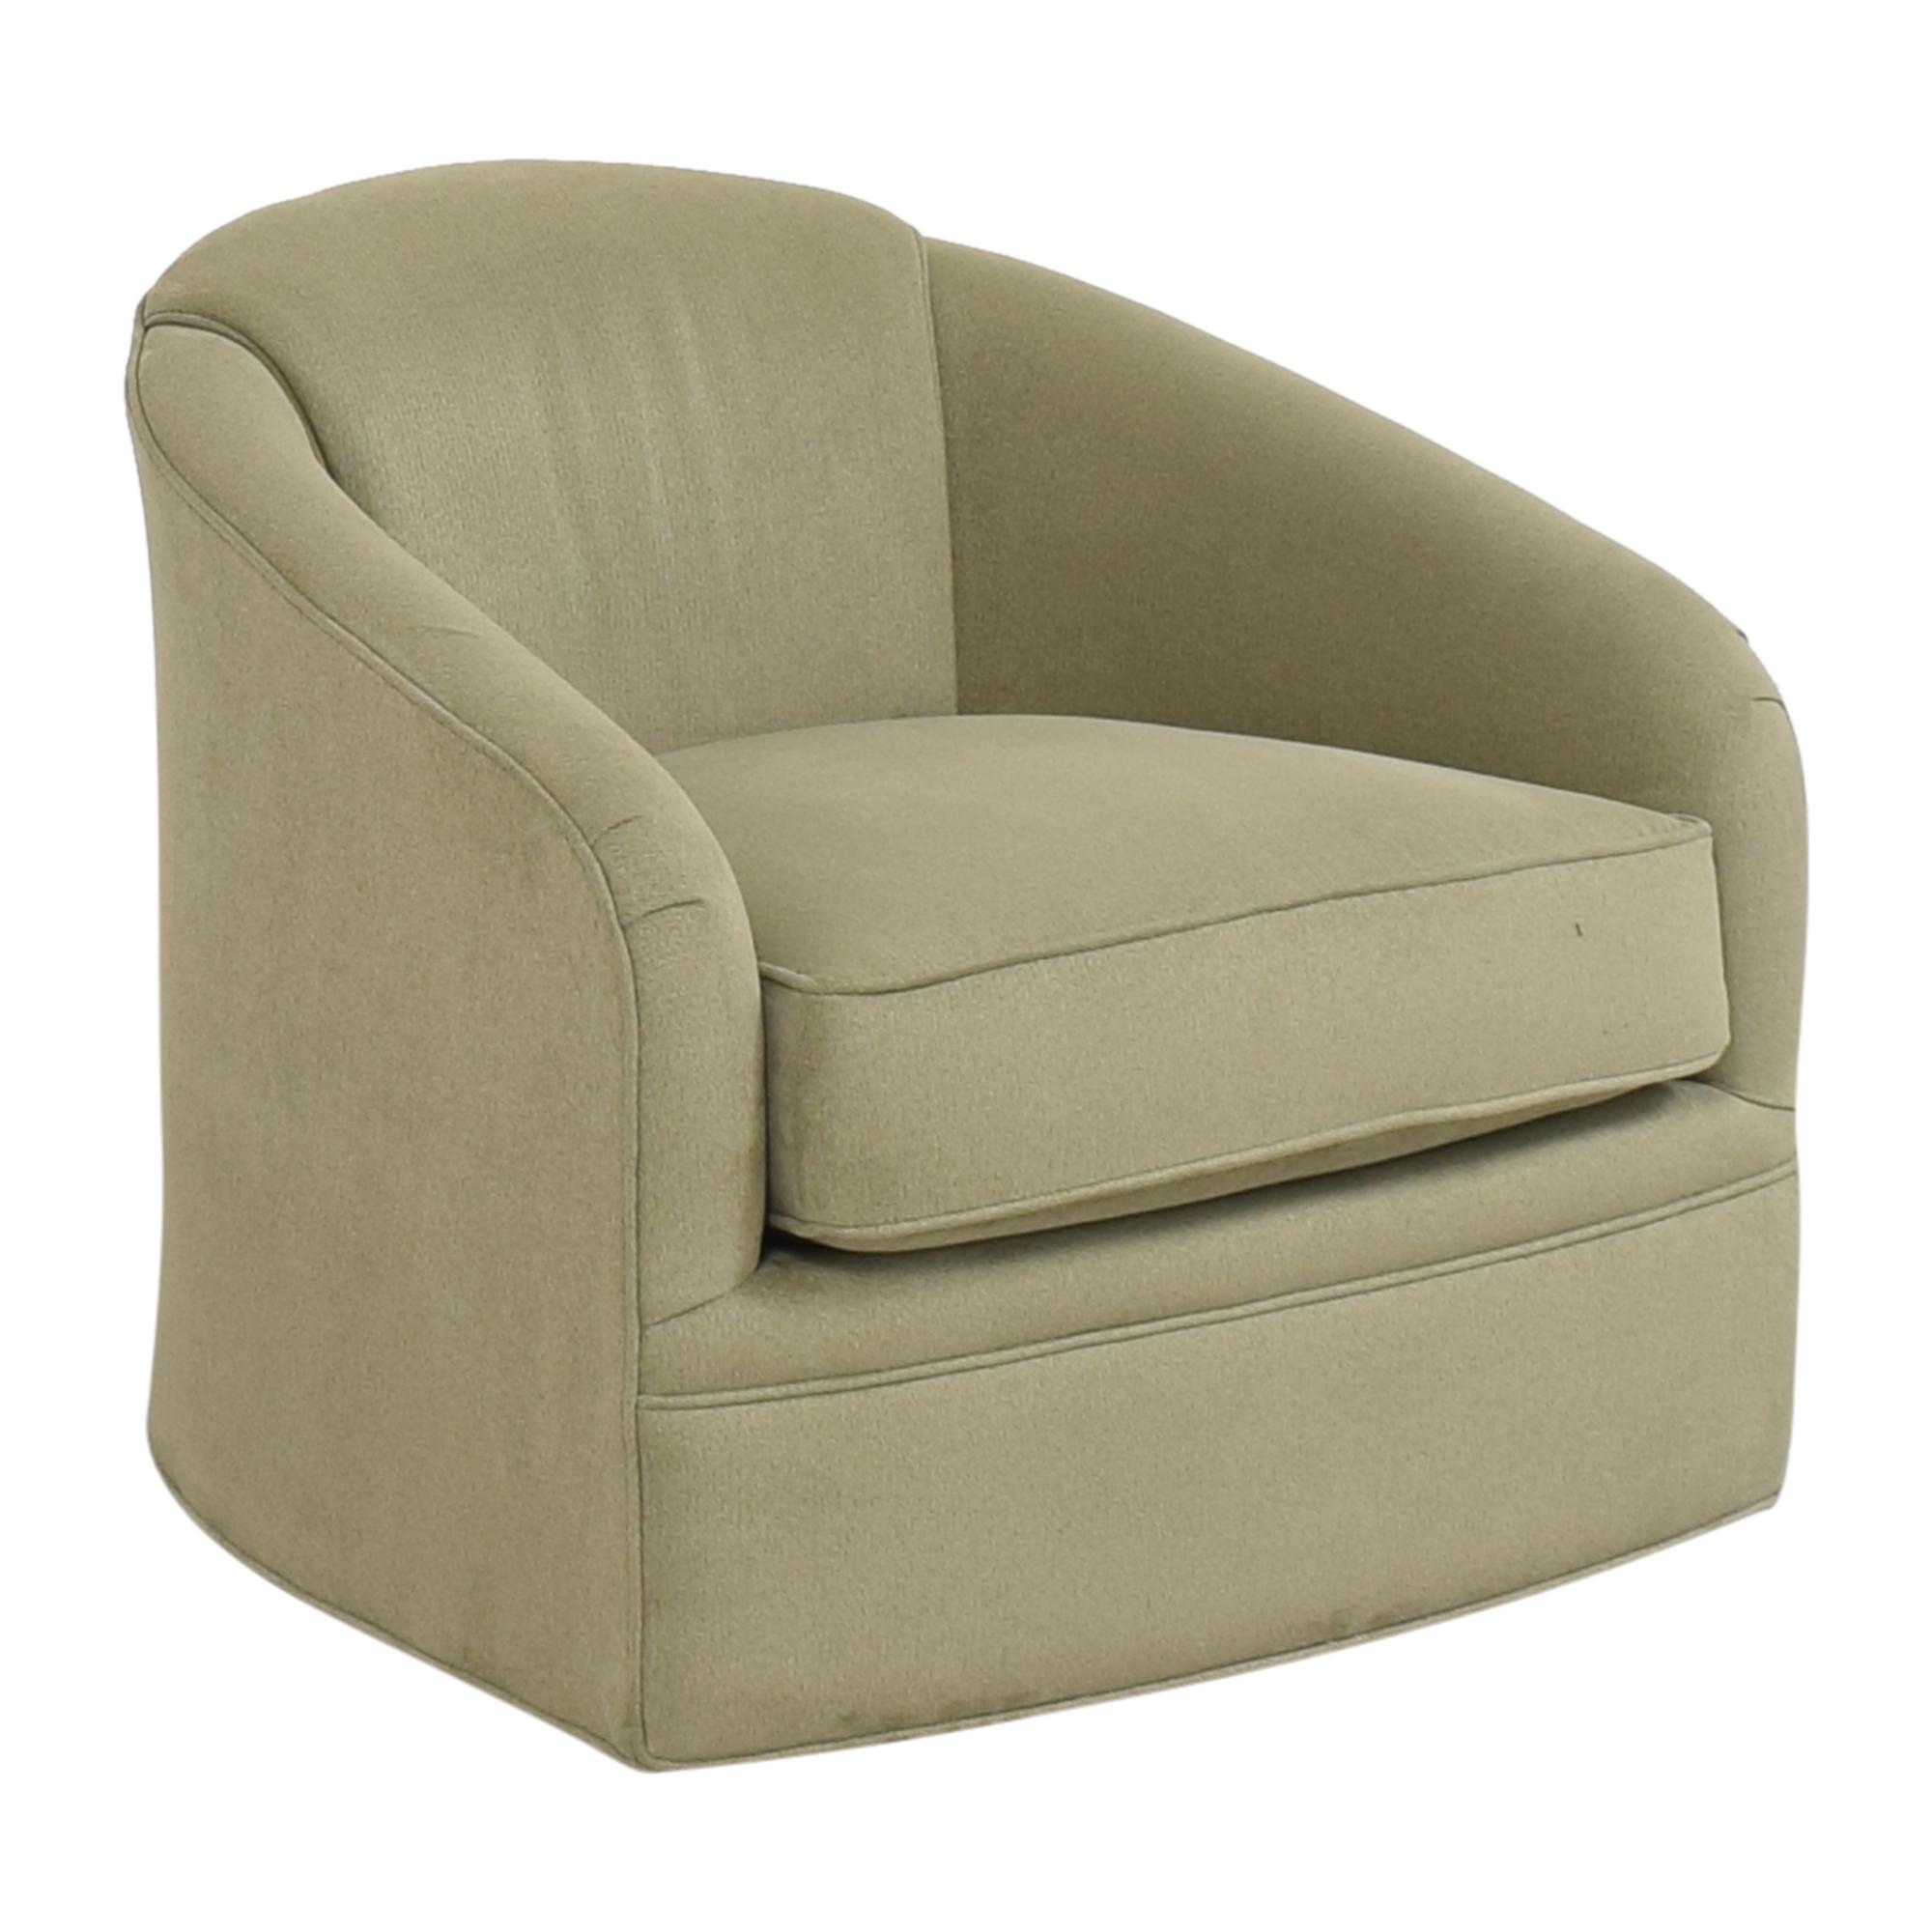 buy Maurice Villency Maurice Villency Cushion Tub Swivel Chair online